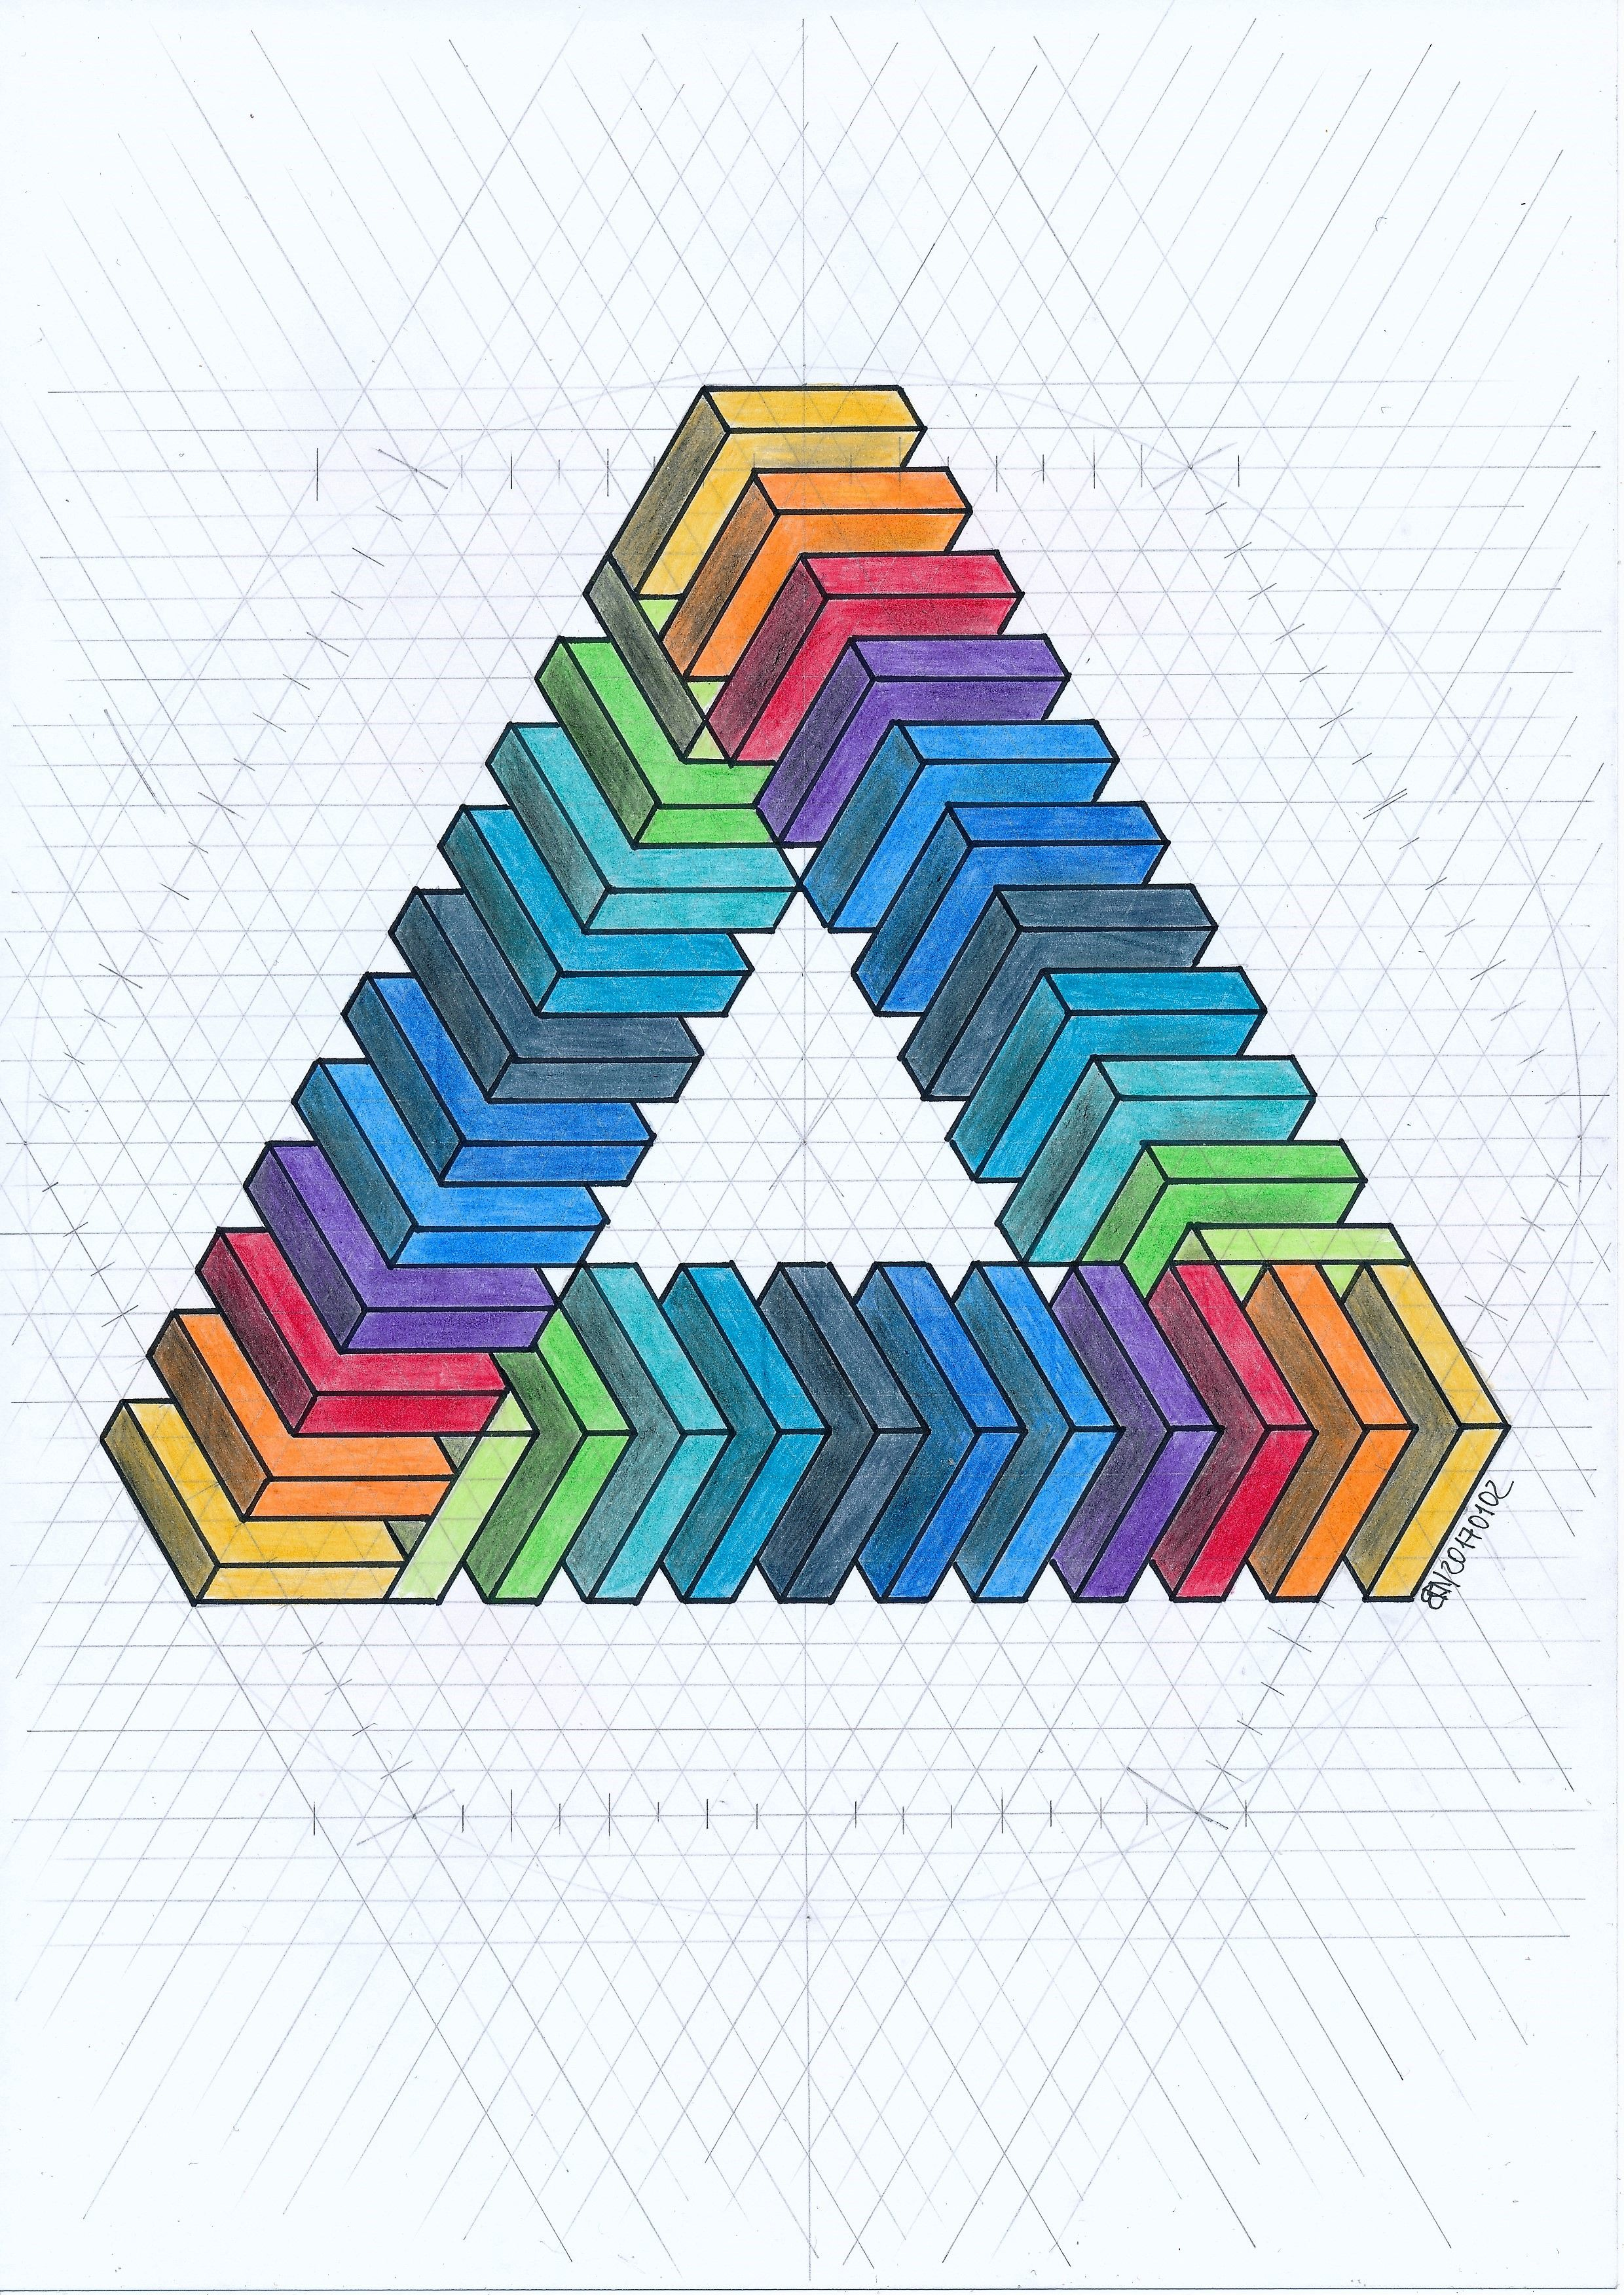 Isometric Penrosetriangle Geometry Symmetry Pattern